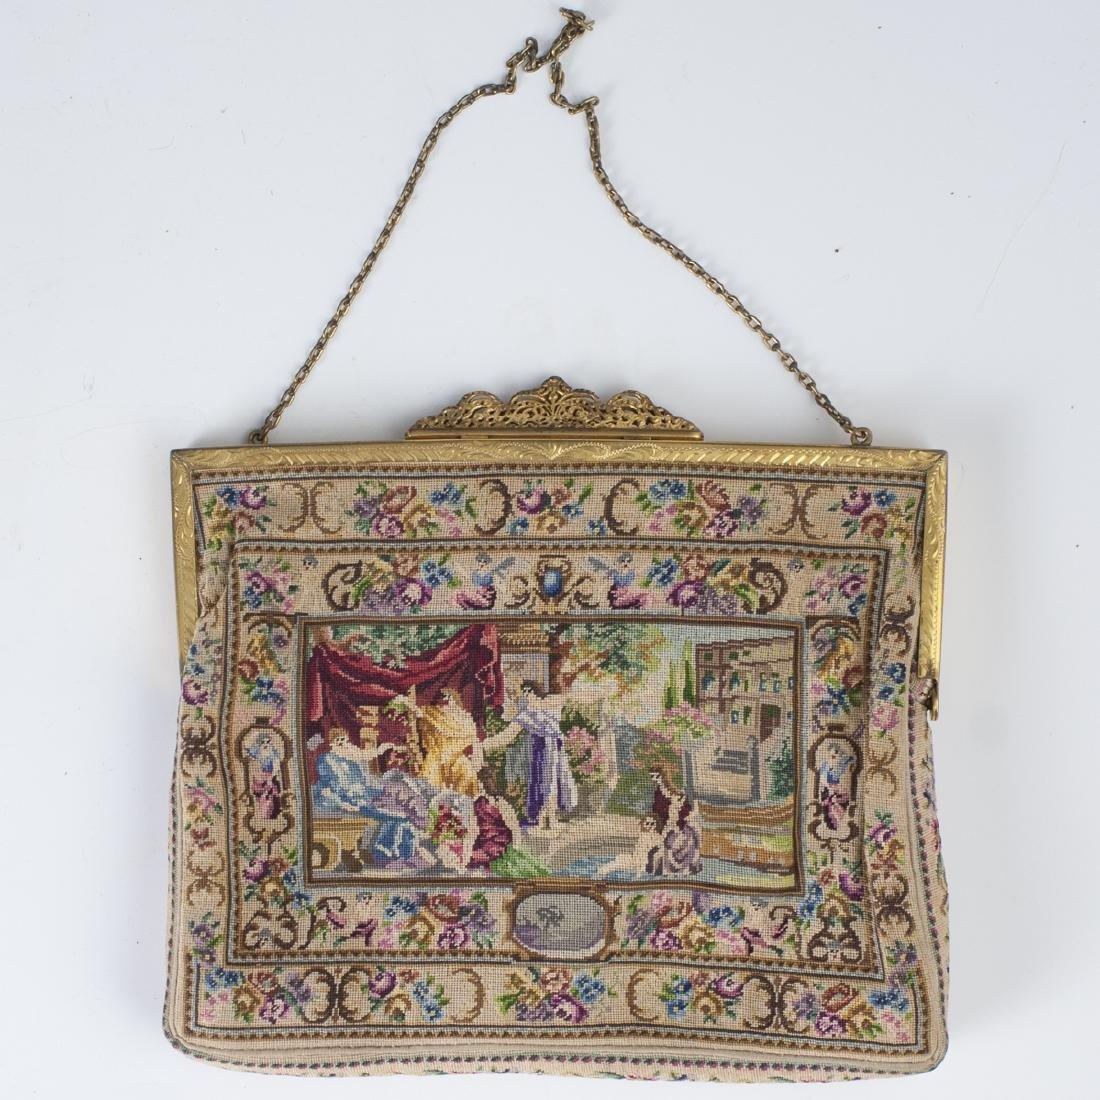 Antique Petit Point Tapestry Purse